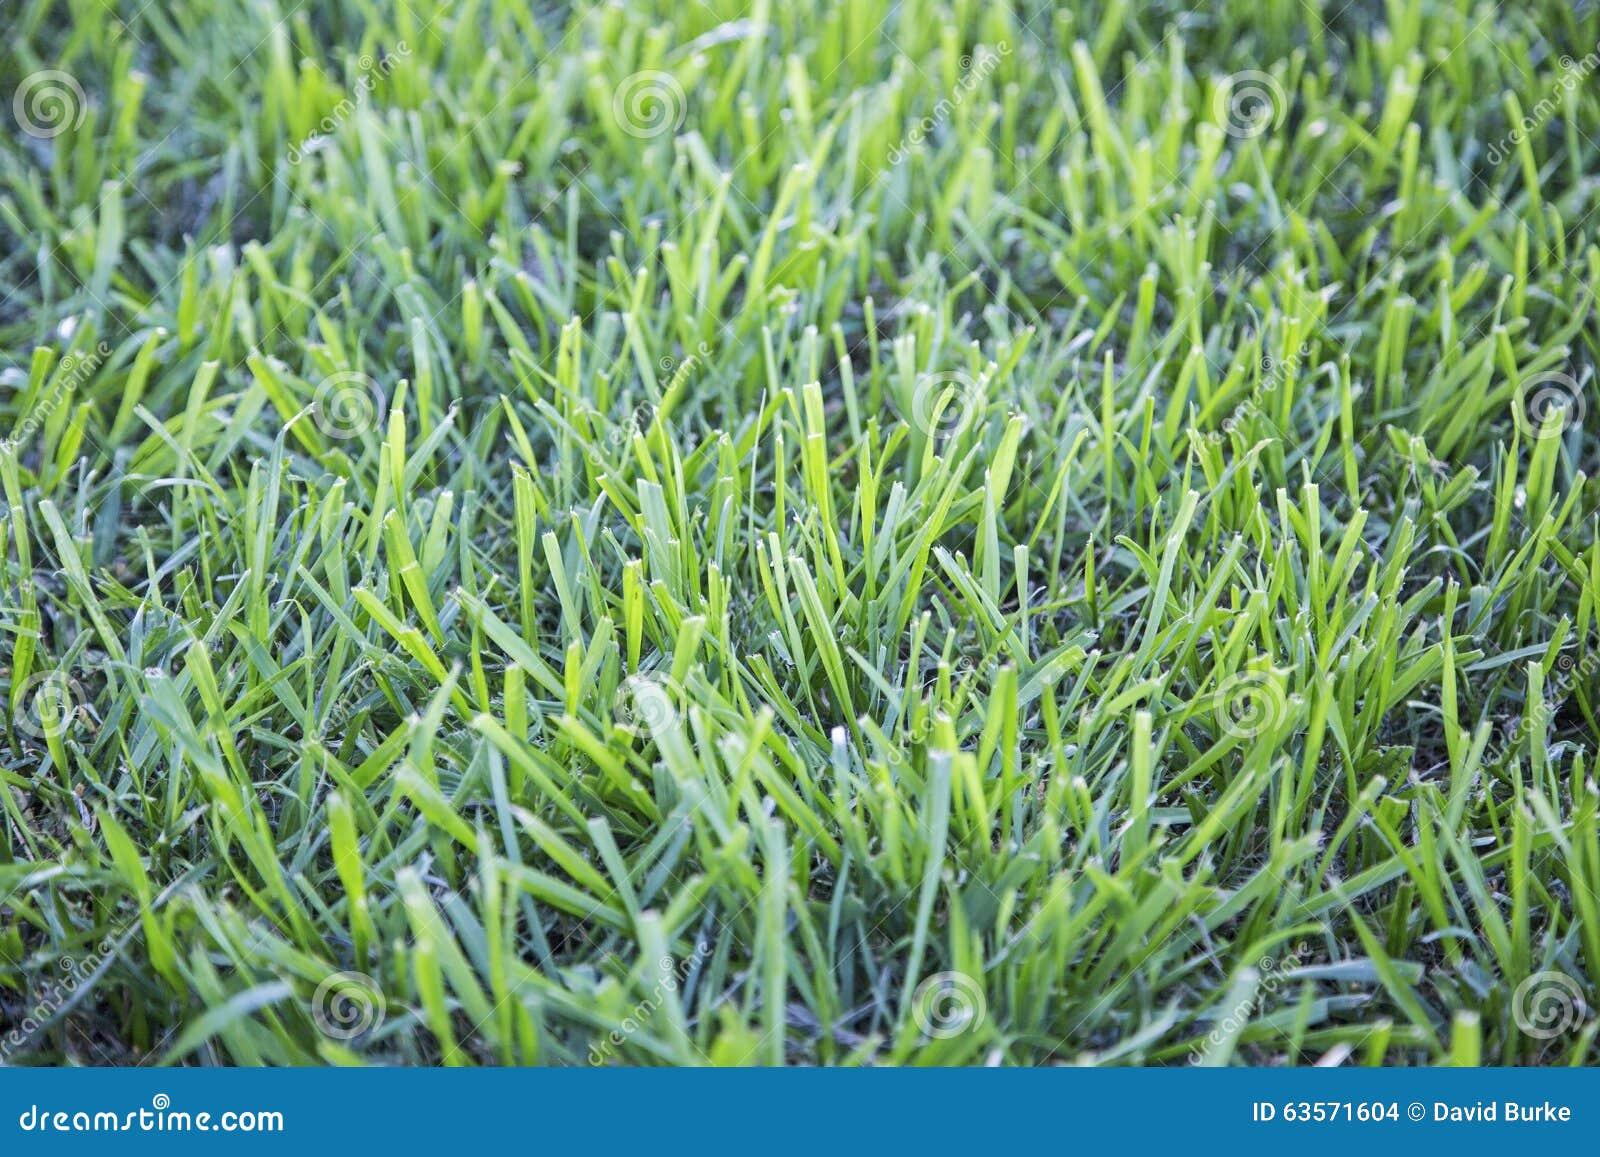 tall green grass field. Download Green Grass Tall Uncut Yard Field Stock Photo - Image Of Bright, Landscape: D